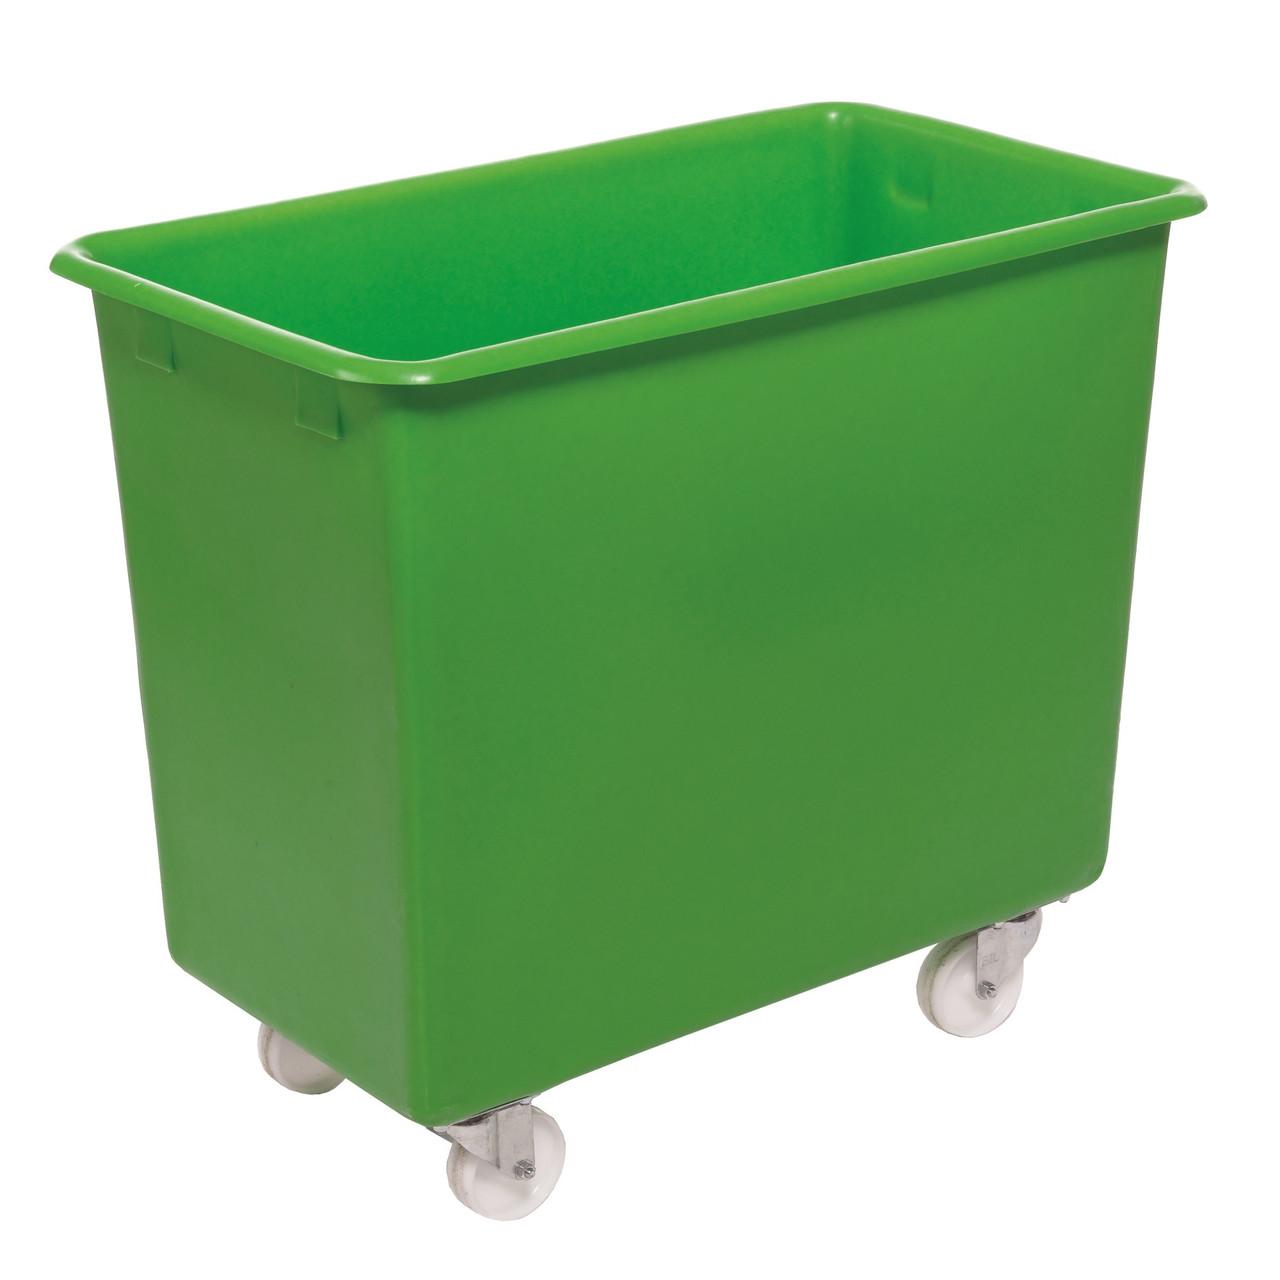 200 Litre  plastic watertight laundry trolley cart